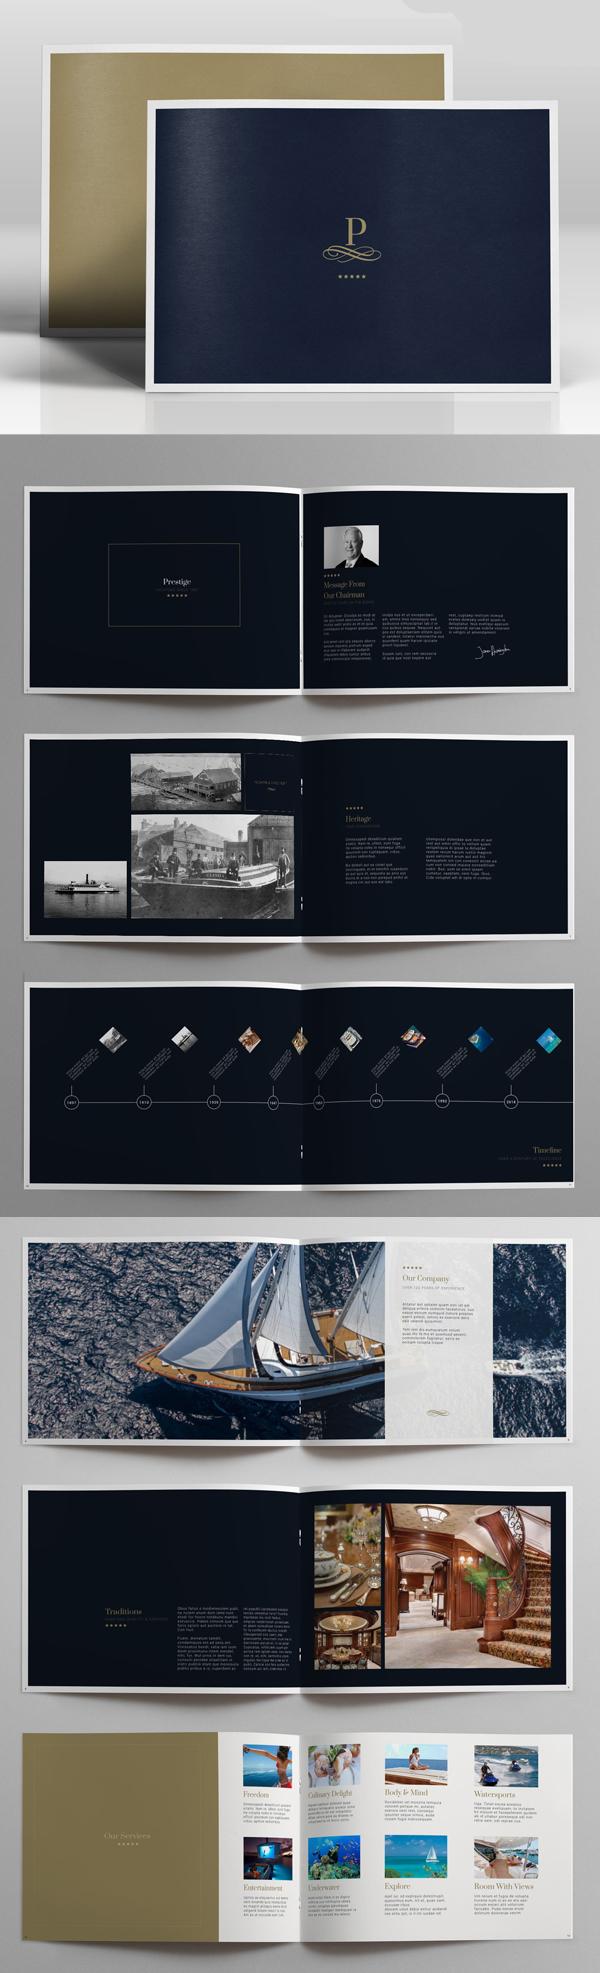 100 Professional Corporate Brochure Templates - 33